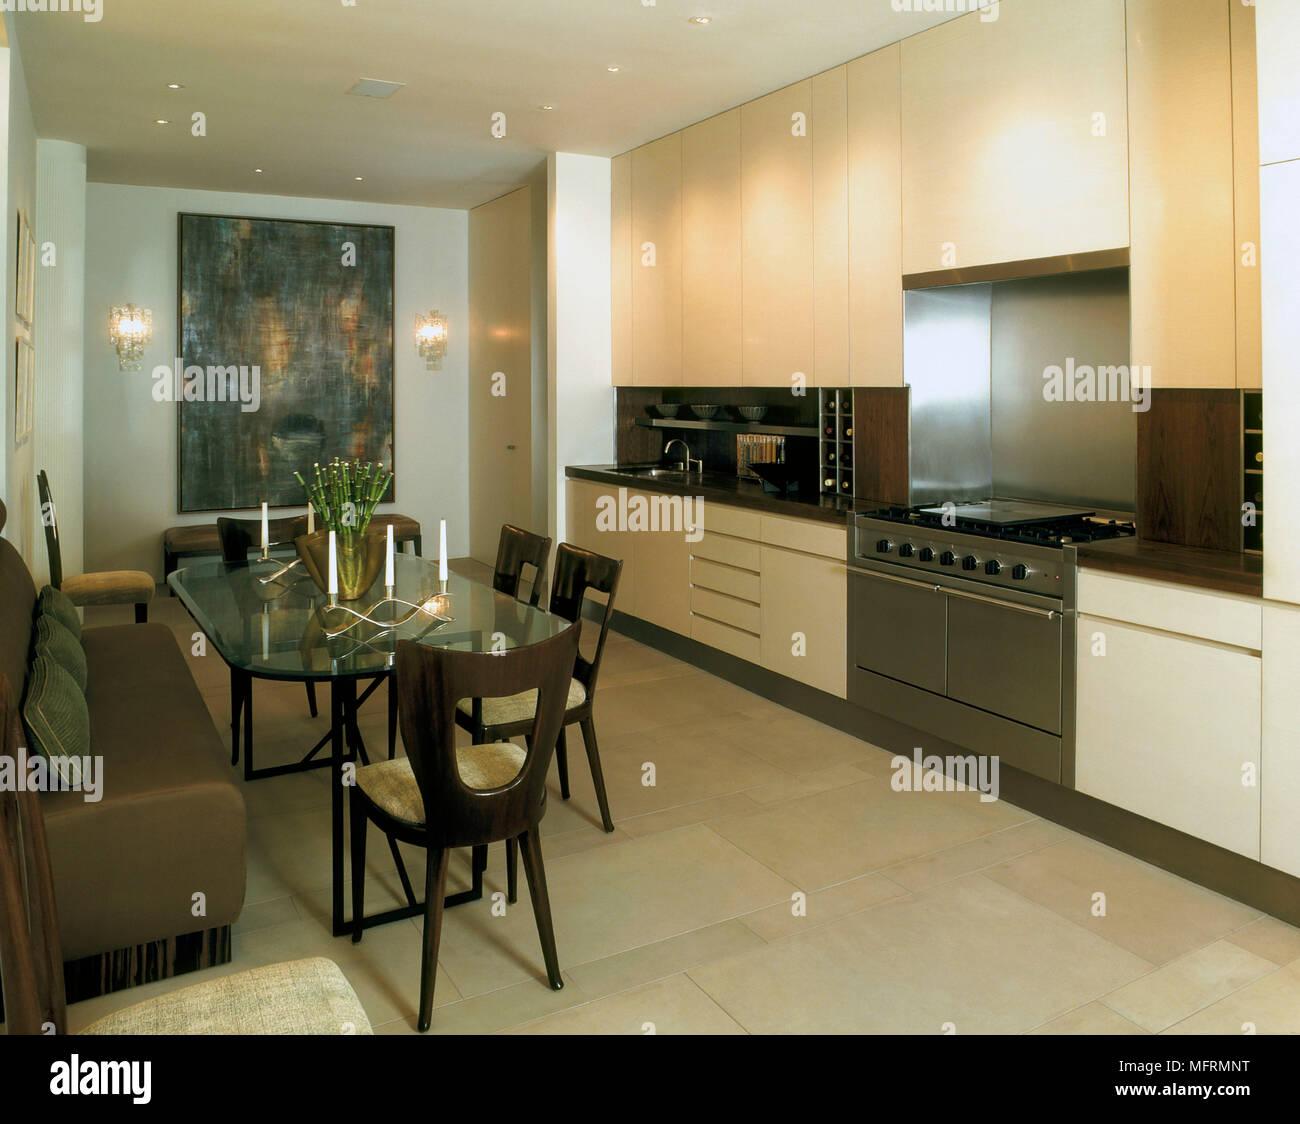 Una moderna cocina abierta con comedor unidades neutral mesa de vidrio  sillas asientos banquetas de piso 306a0a293c5e